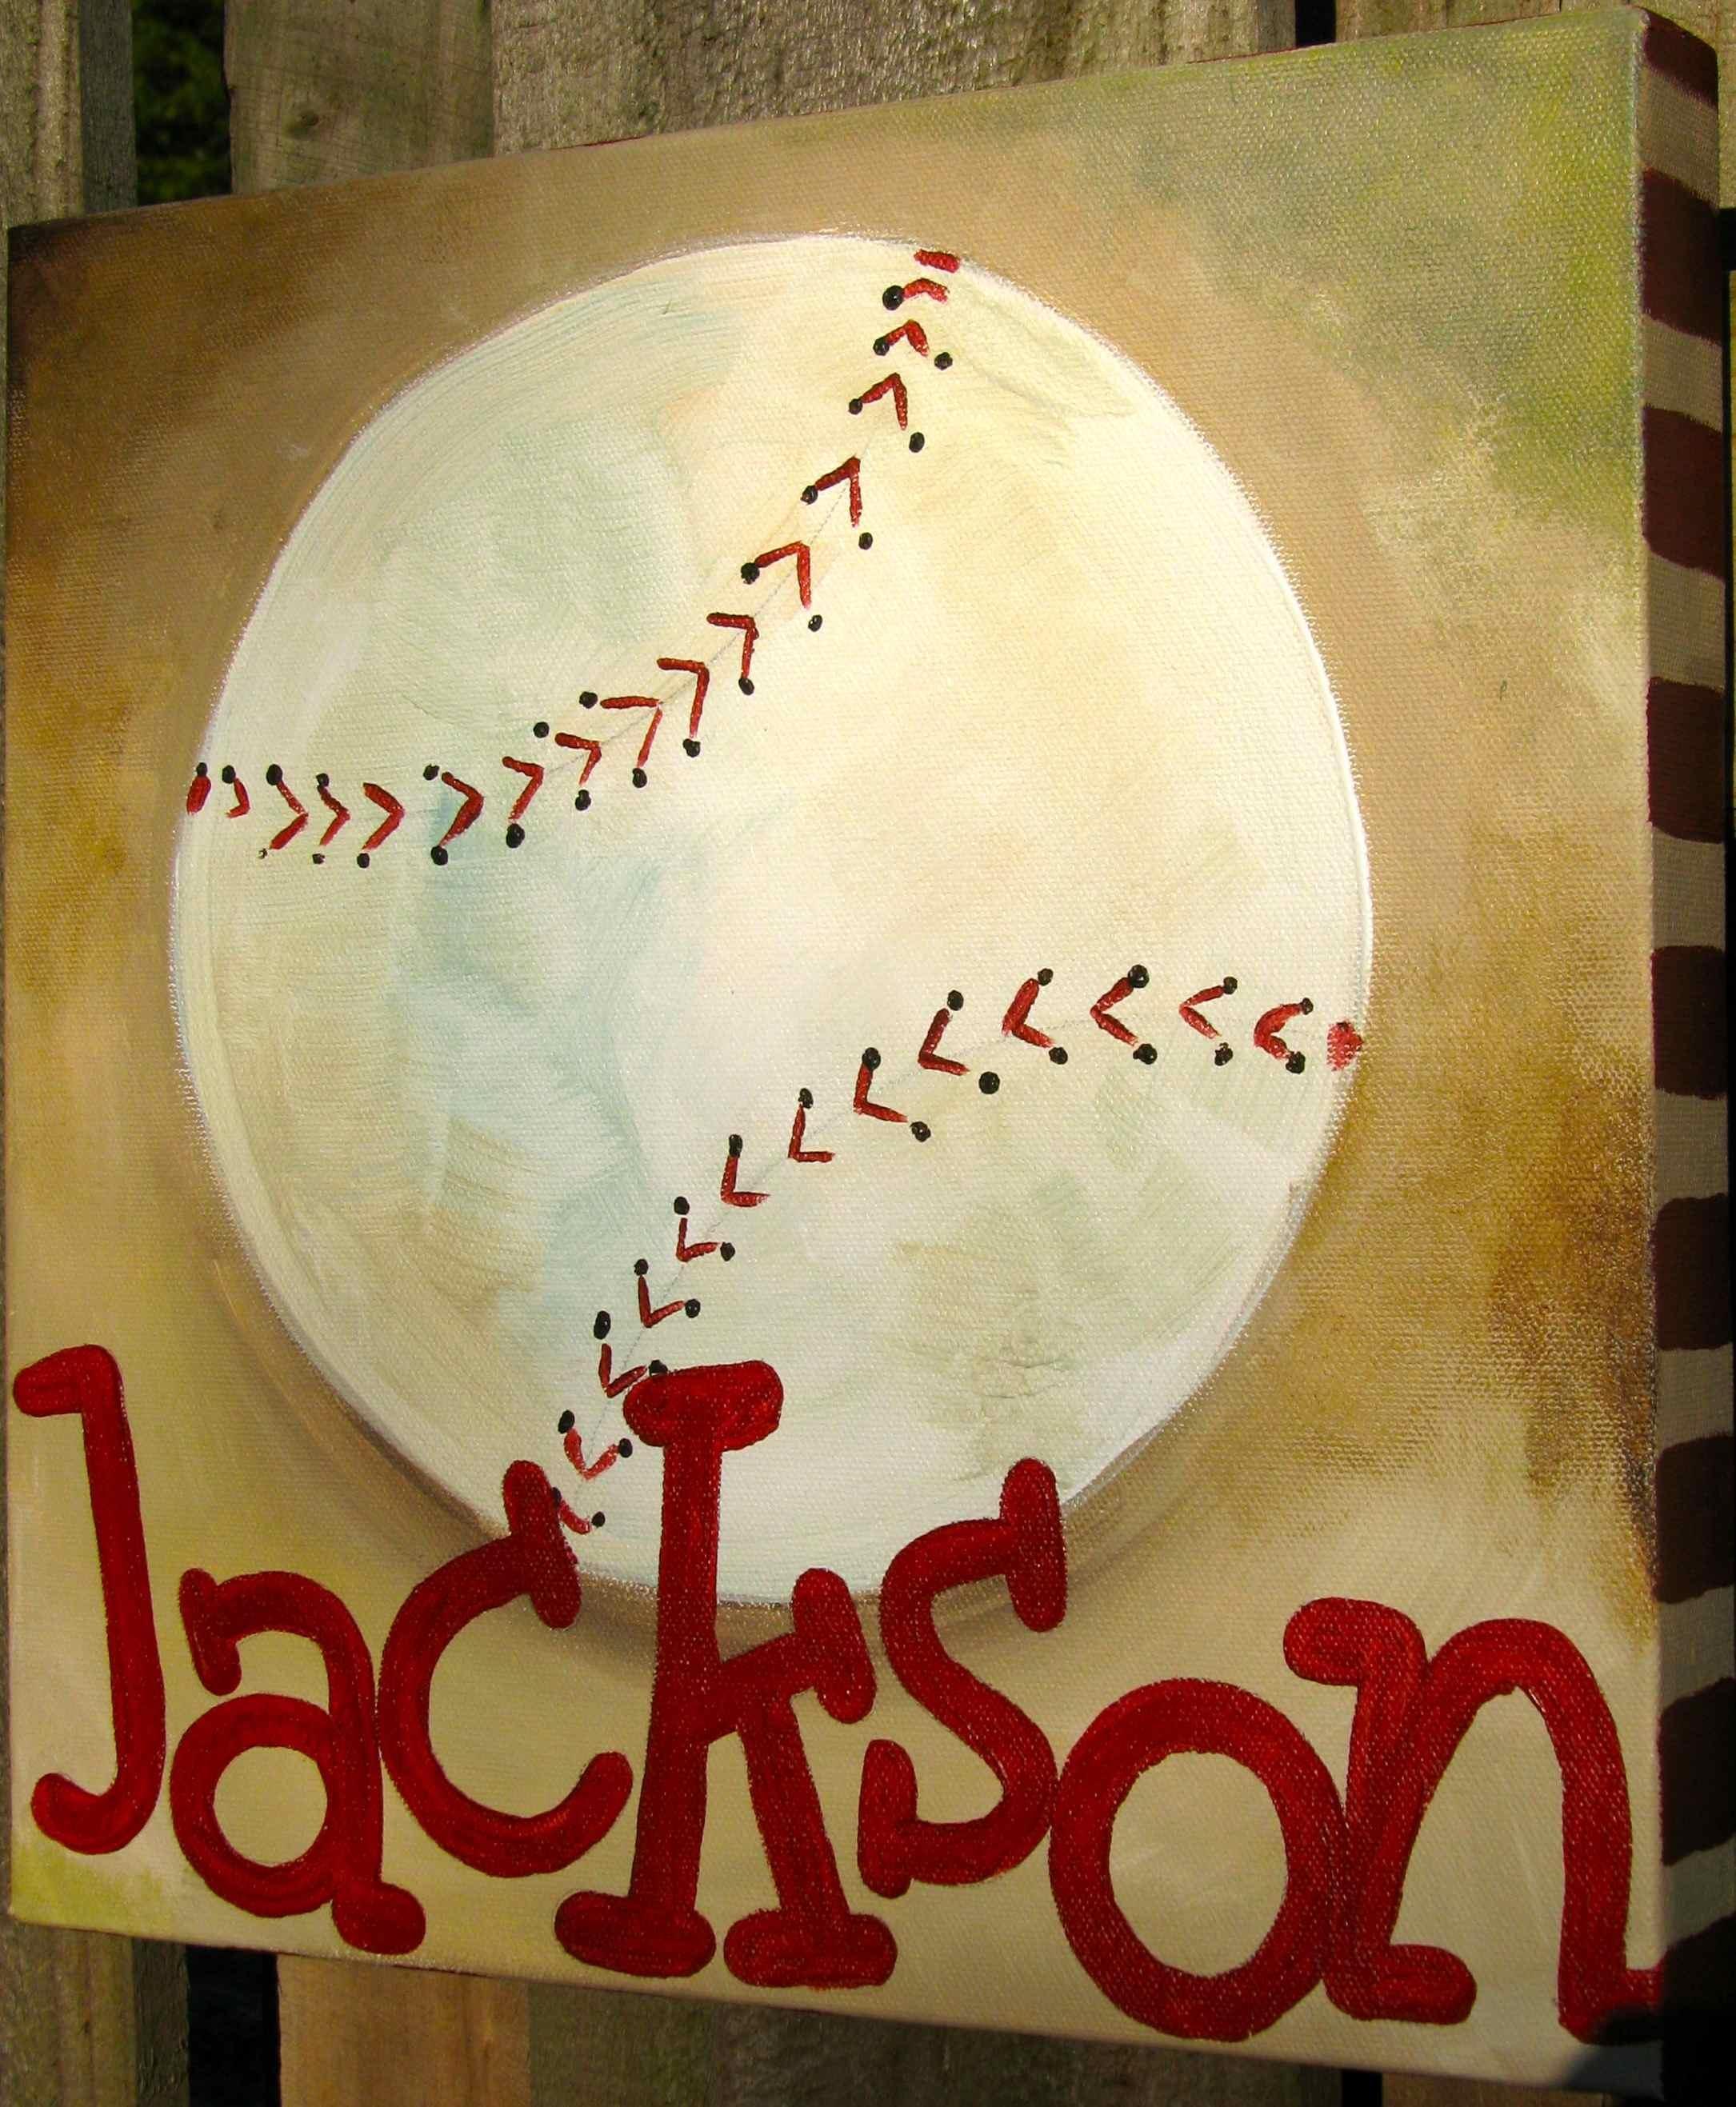 Nursery Beddings Vintage Baseball Wall Art Also Baseball Ideas For Pertaining To Vintage Baseball Wall Art (Image 16 of 20)